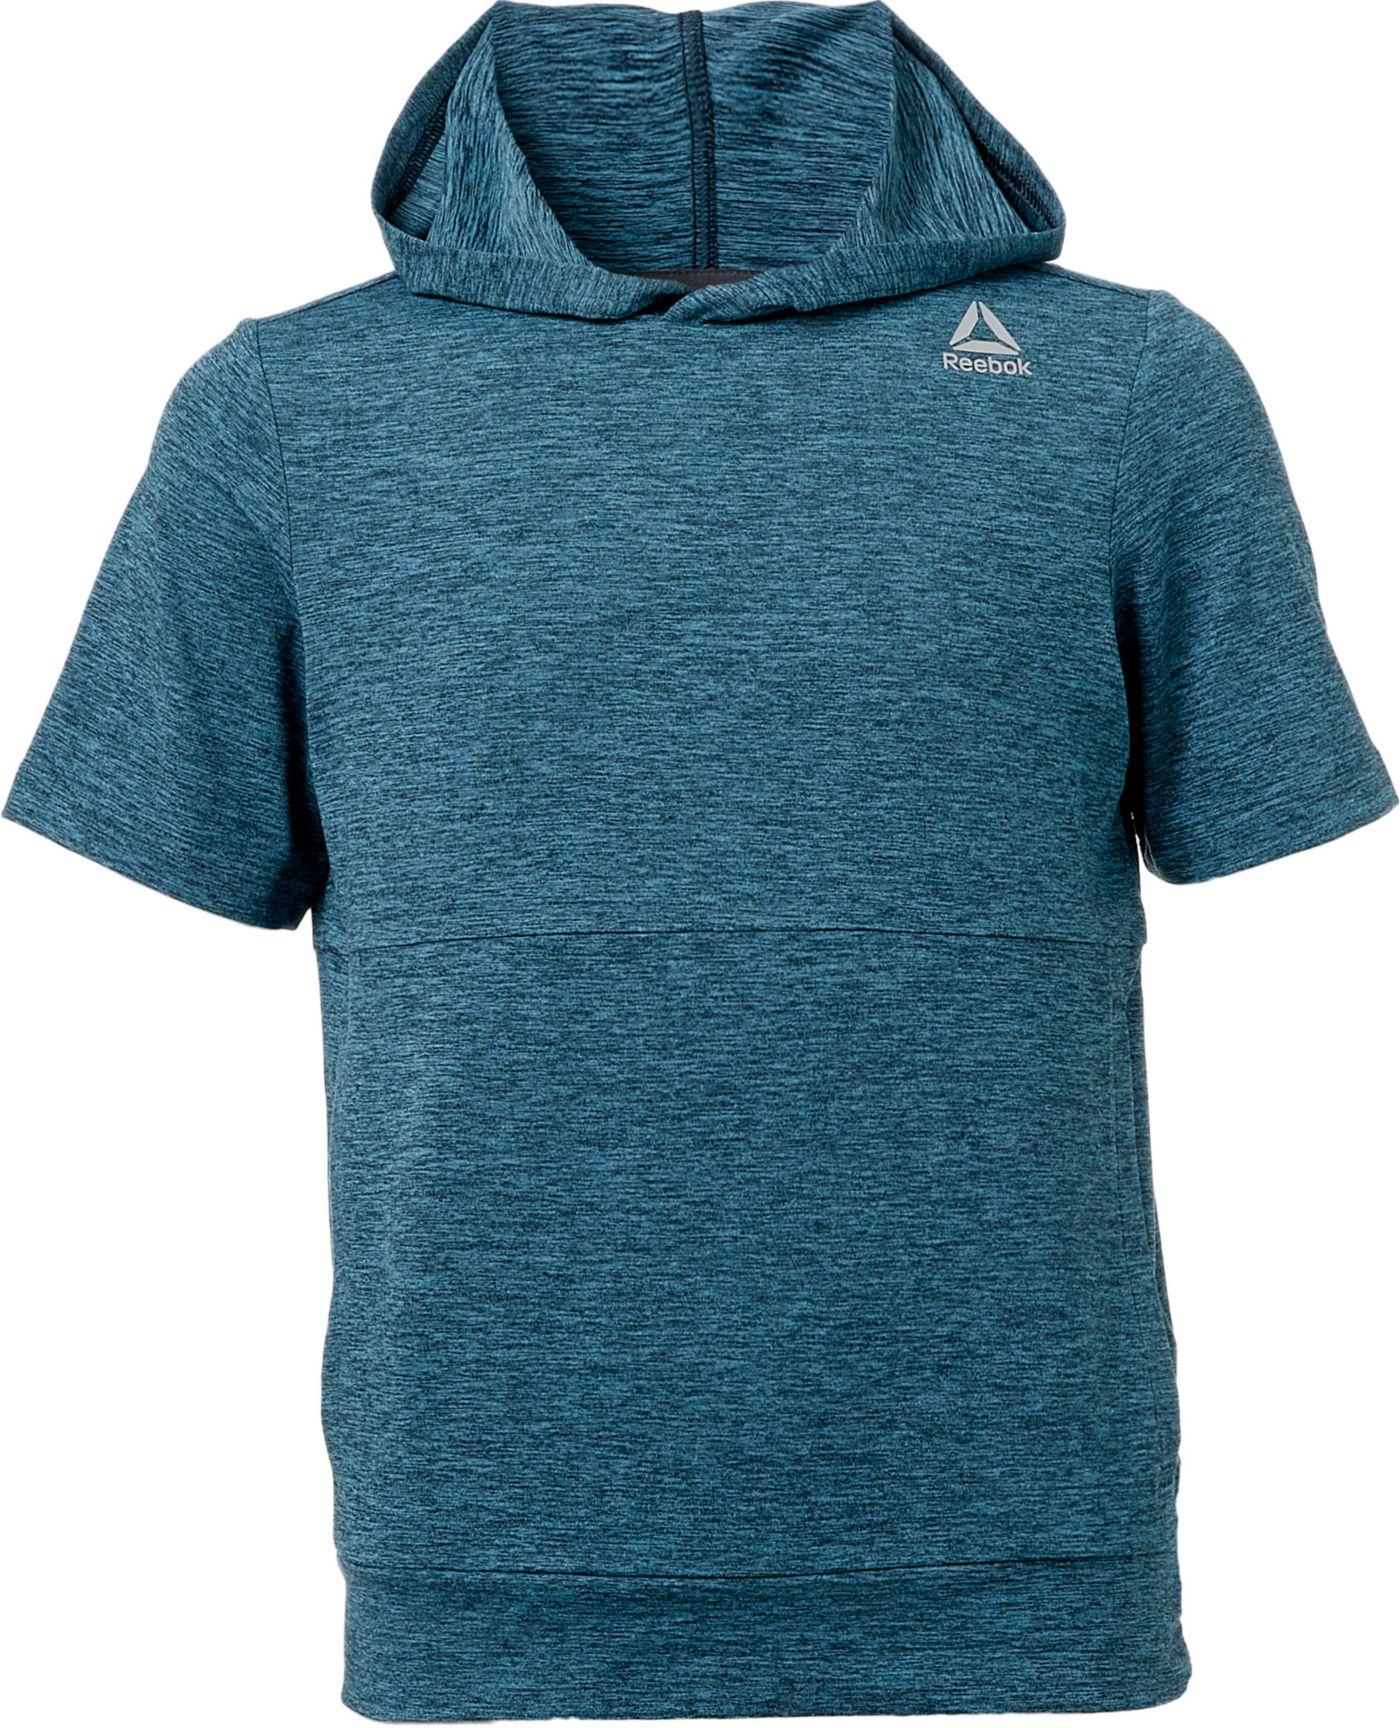 Reebok Boys' 24/7 Jersey Short Sleeve Hoodie